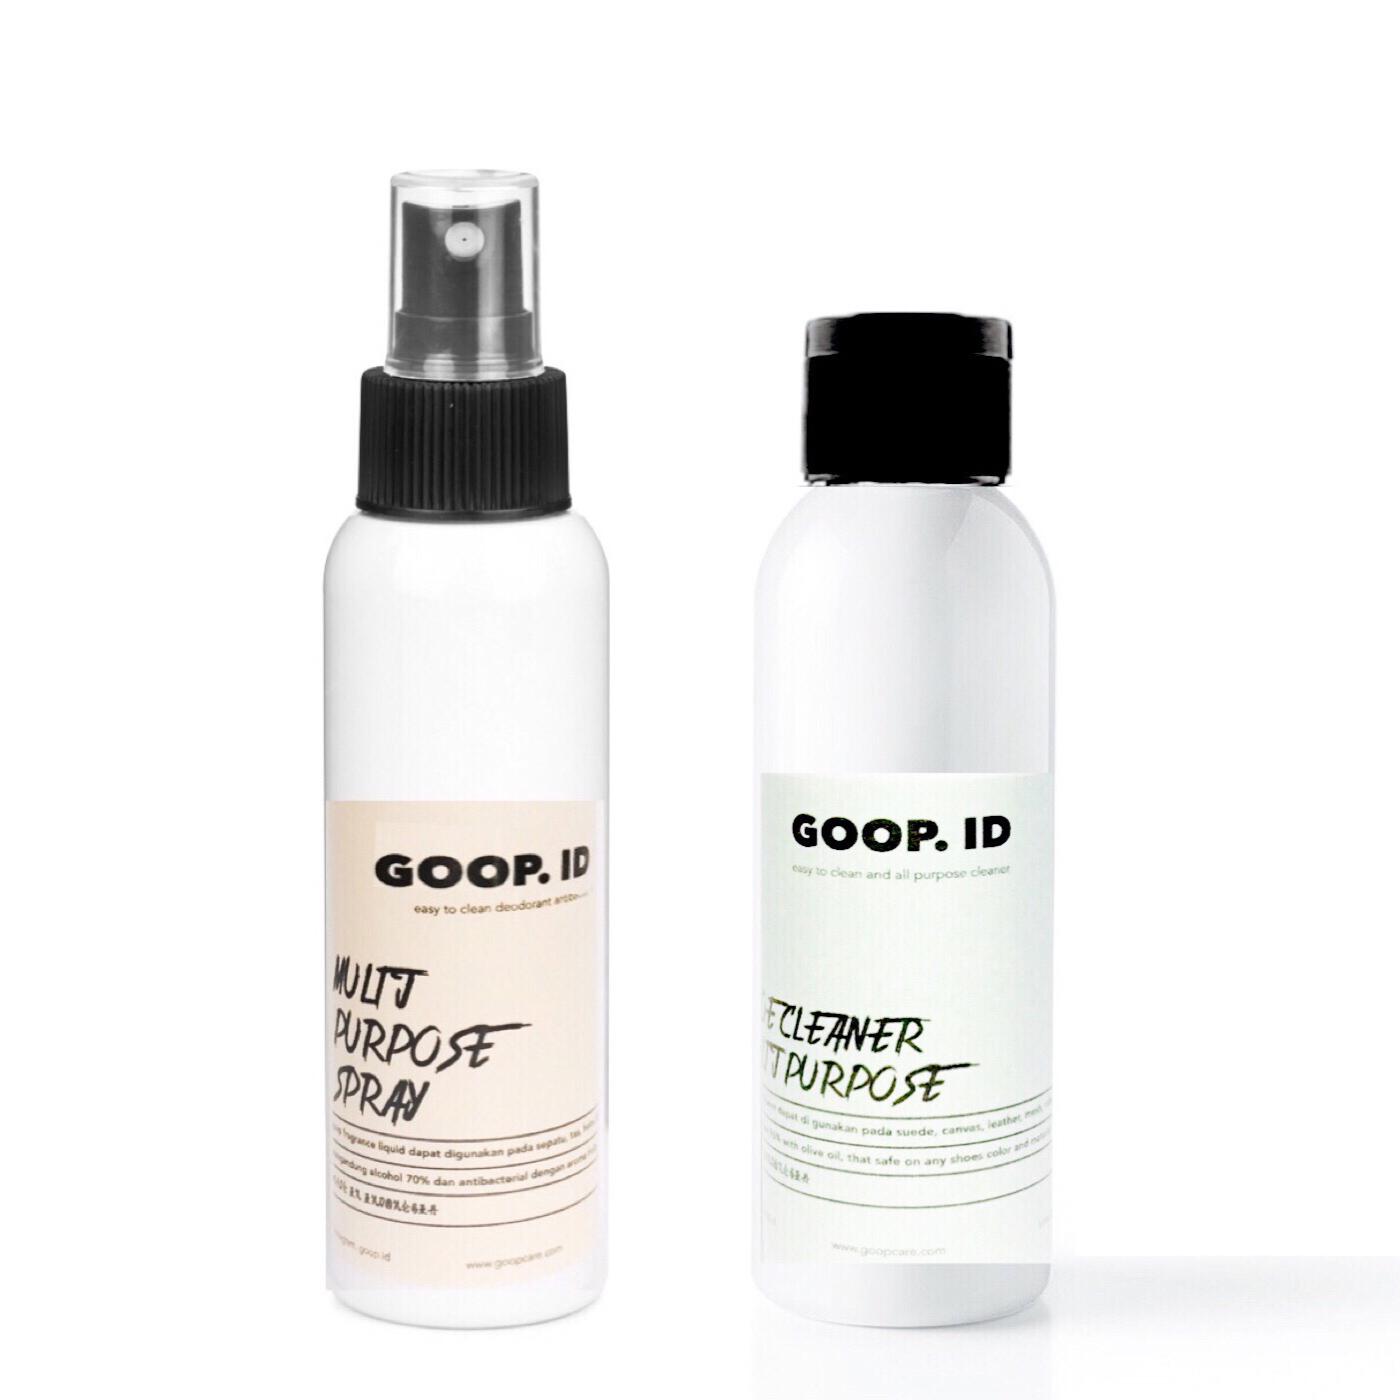 Jual GOOP SHOE CLEANER Paket 100ml - Pembersih sepatu - GOOP ID   Tokopedia